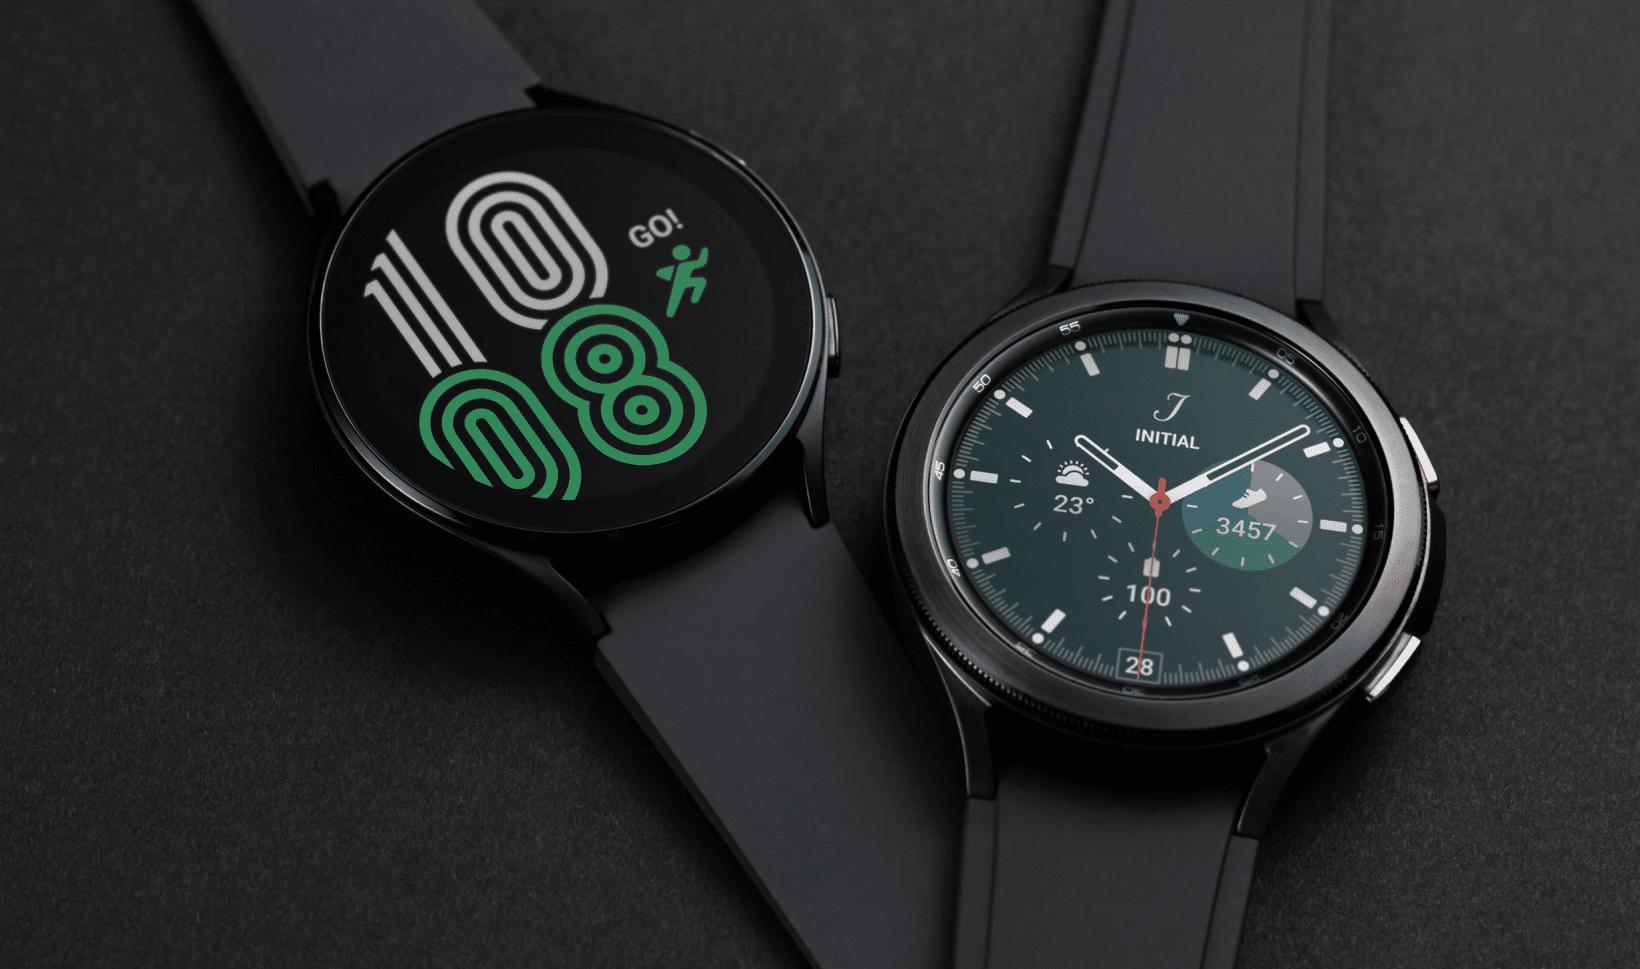 Samsung Galaxy Watch 4 and Watch 4 Classic